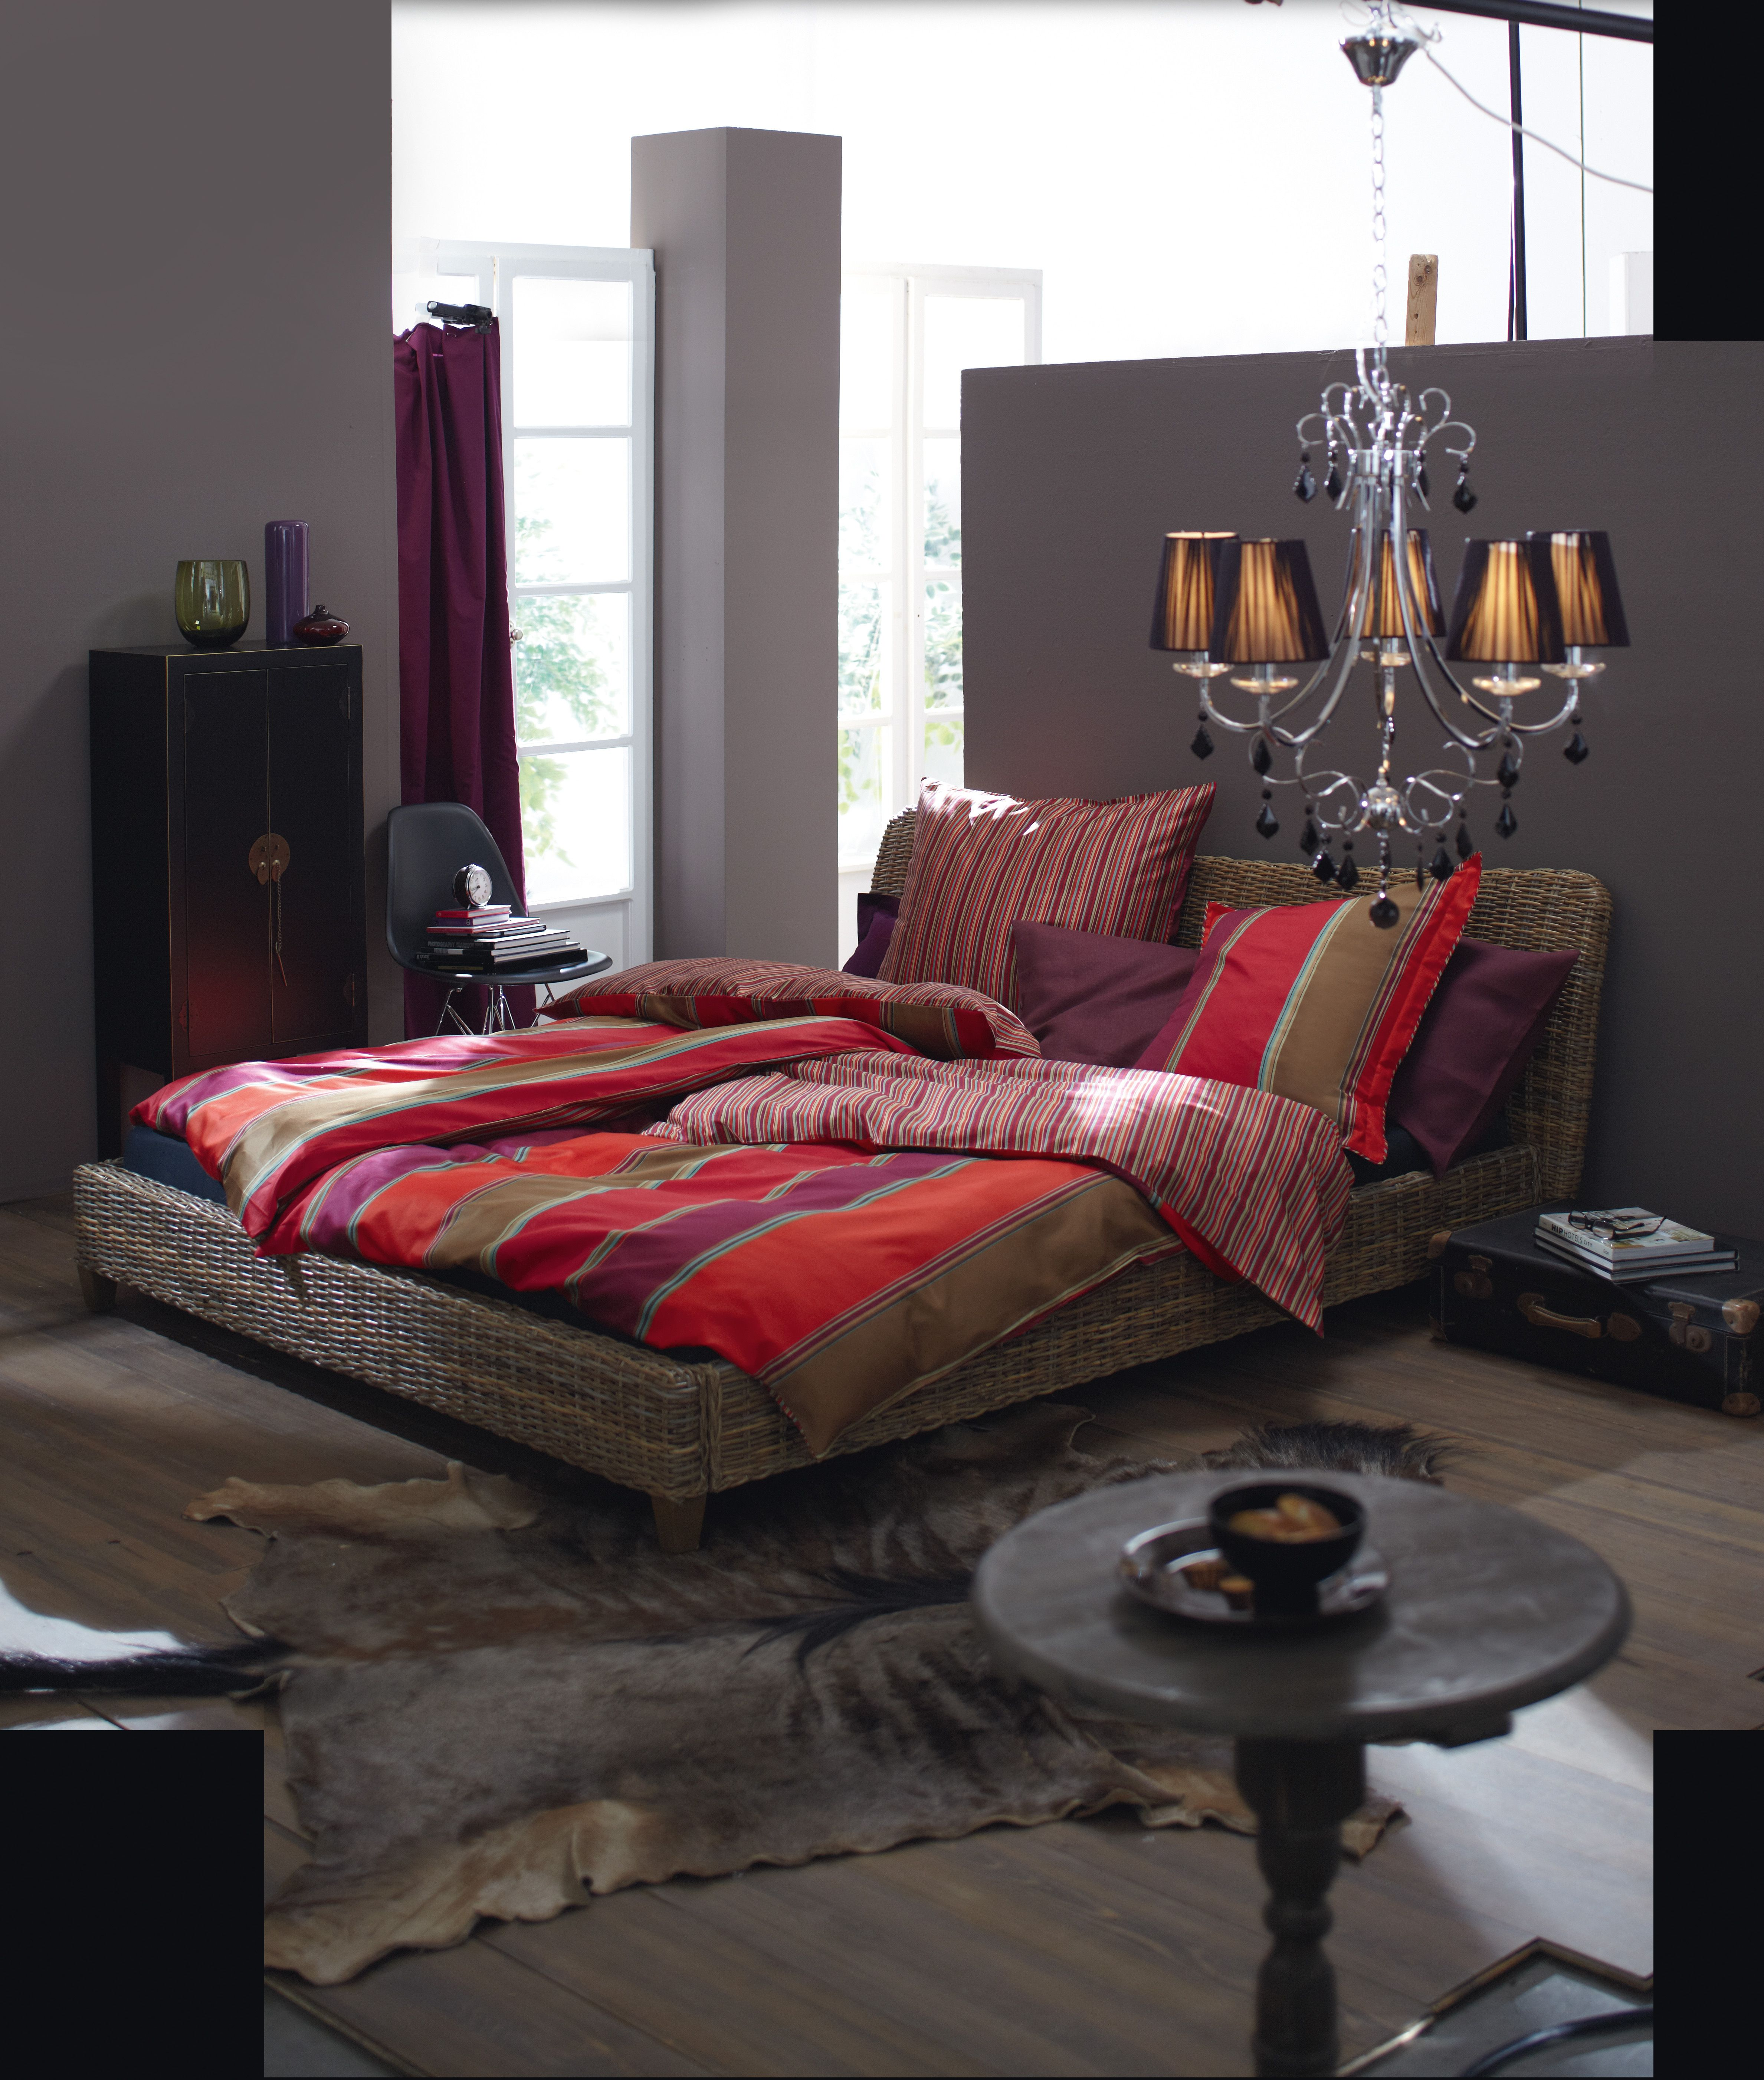 Rattanbett rattan bed impressionen schlafzimmer bedroom pinterest - Rattan schlafzimmer ...